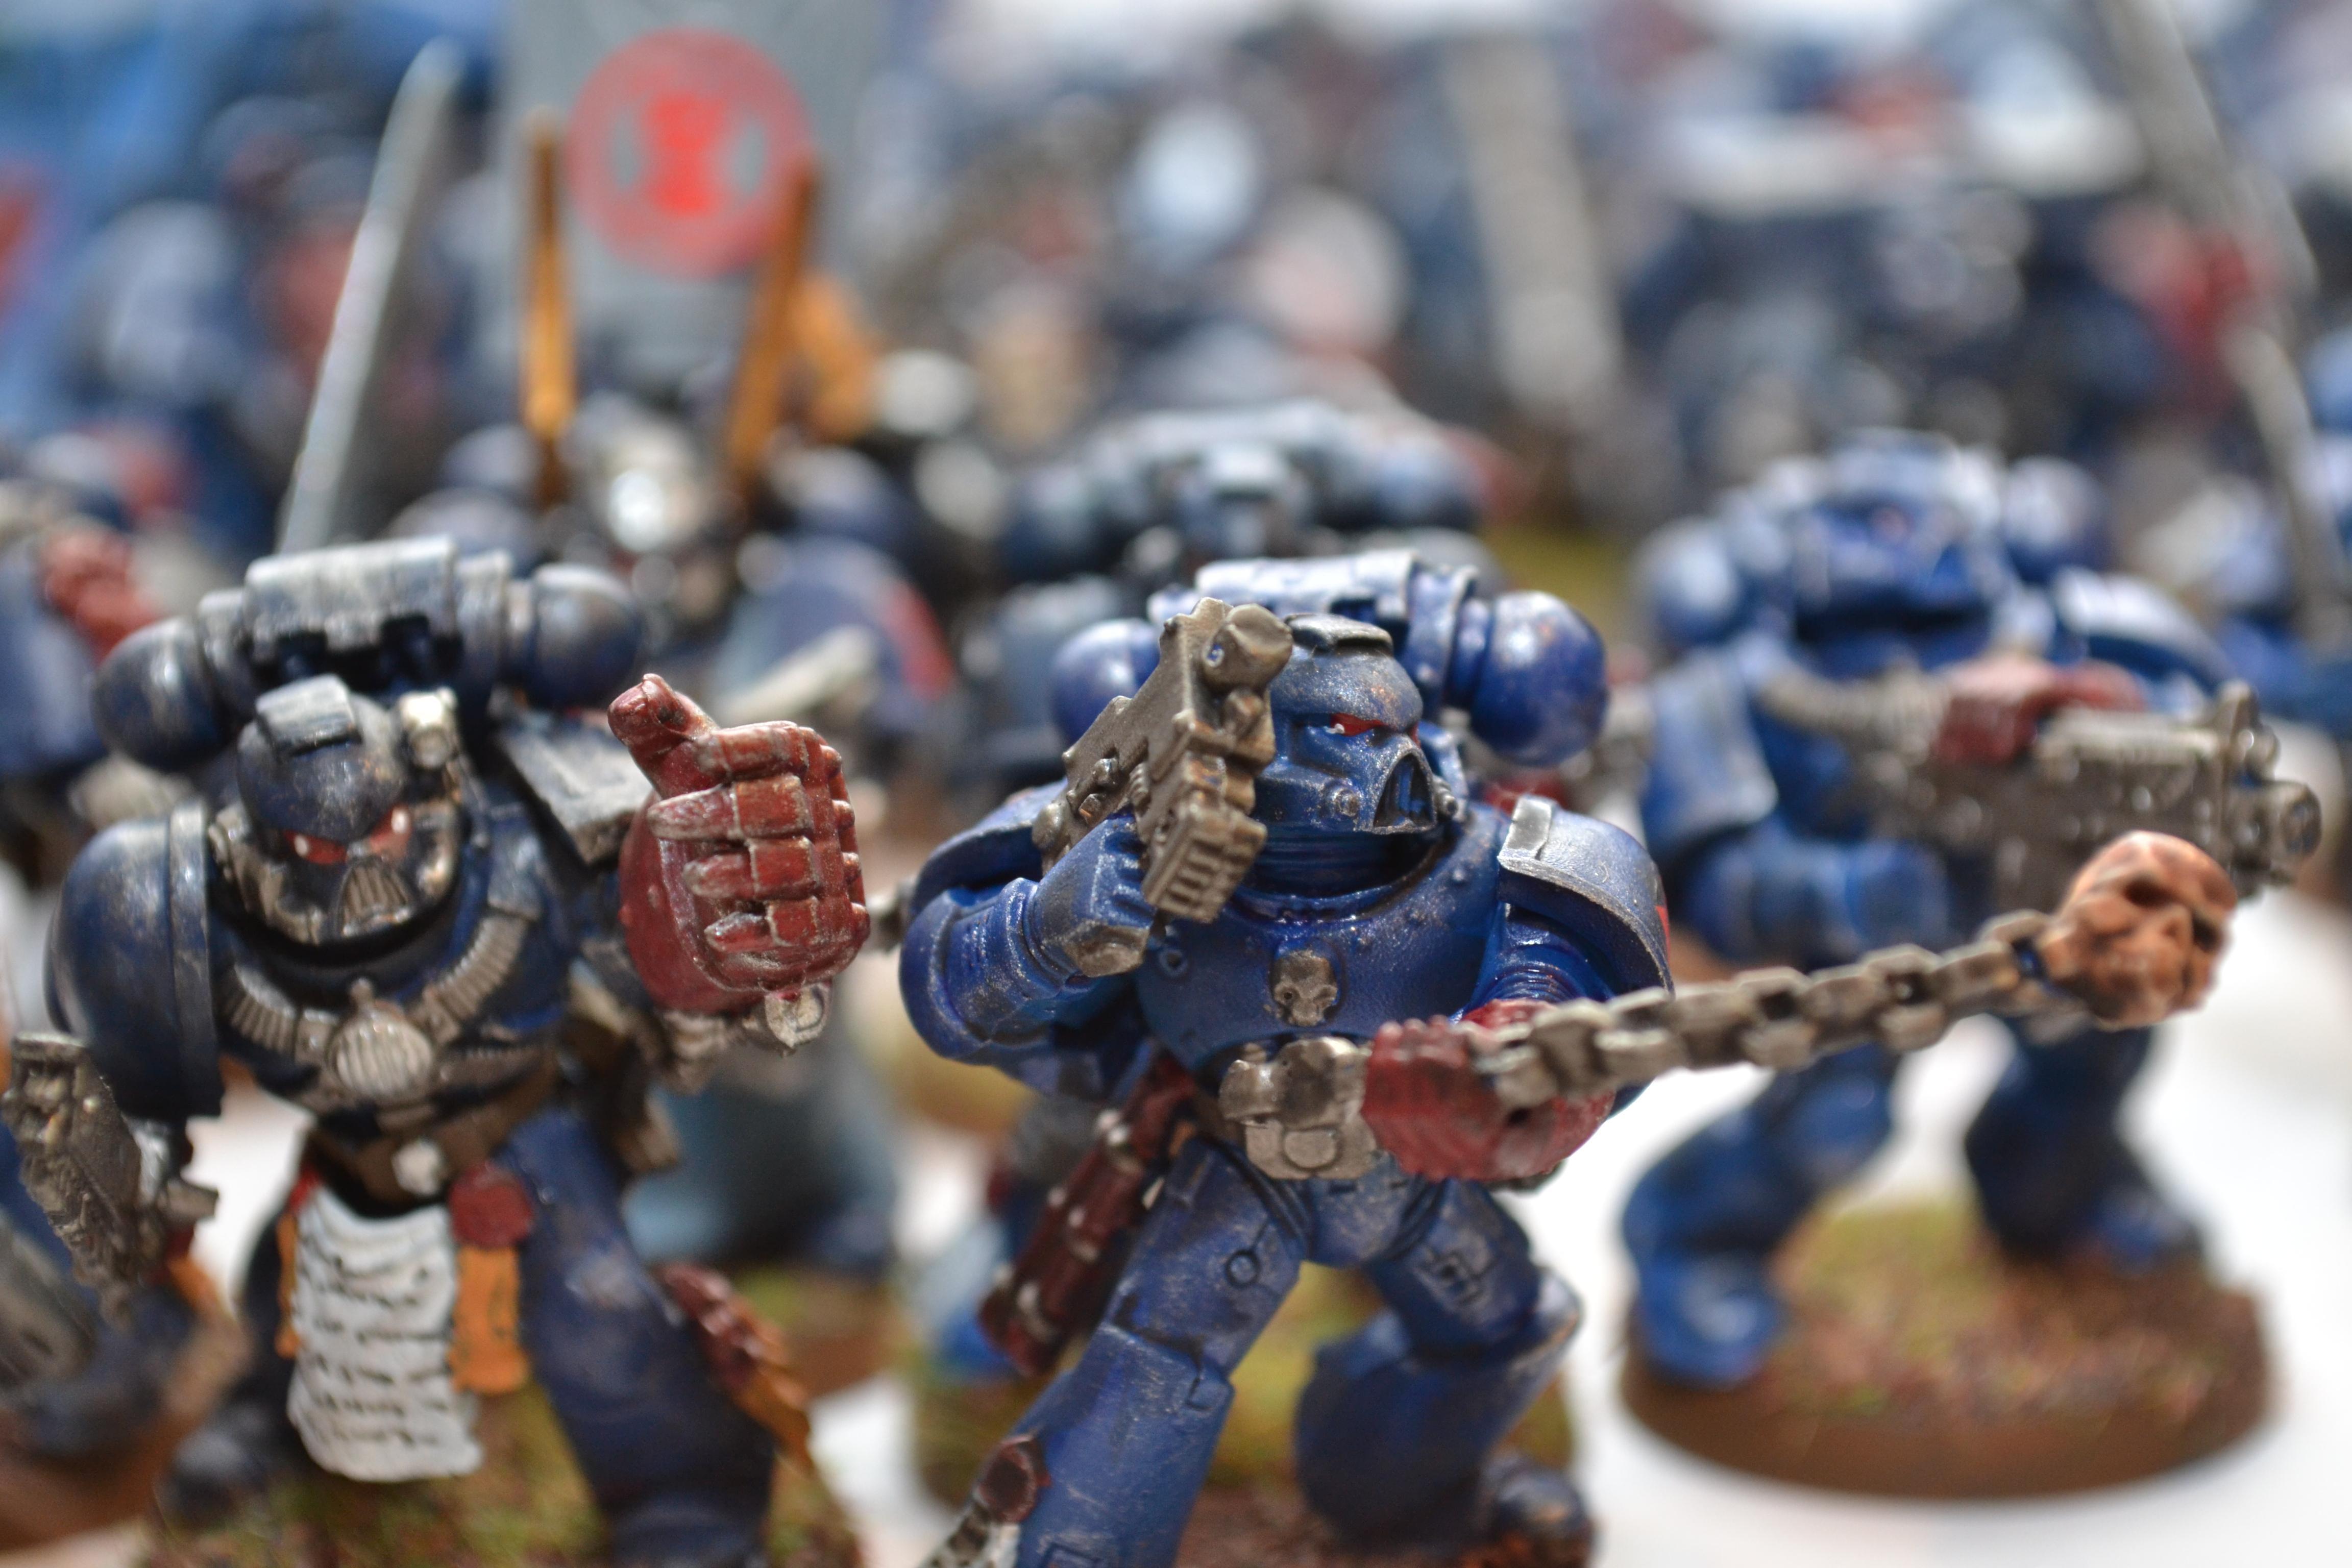 Crimson Fists, Power Armor, Space Marines